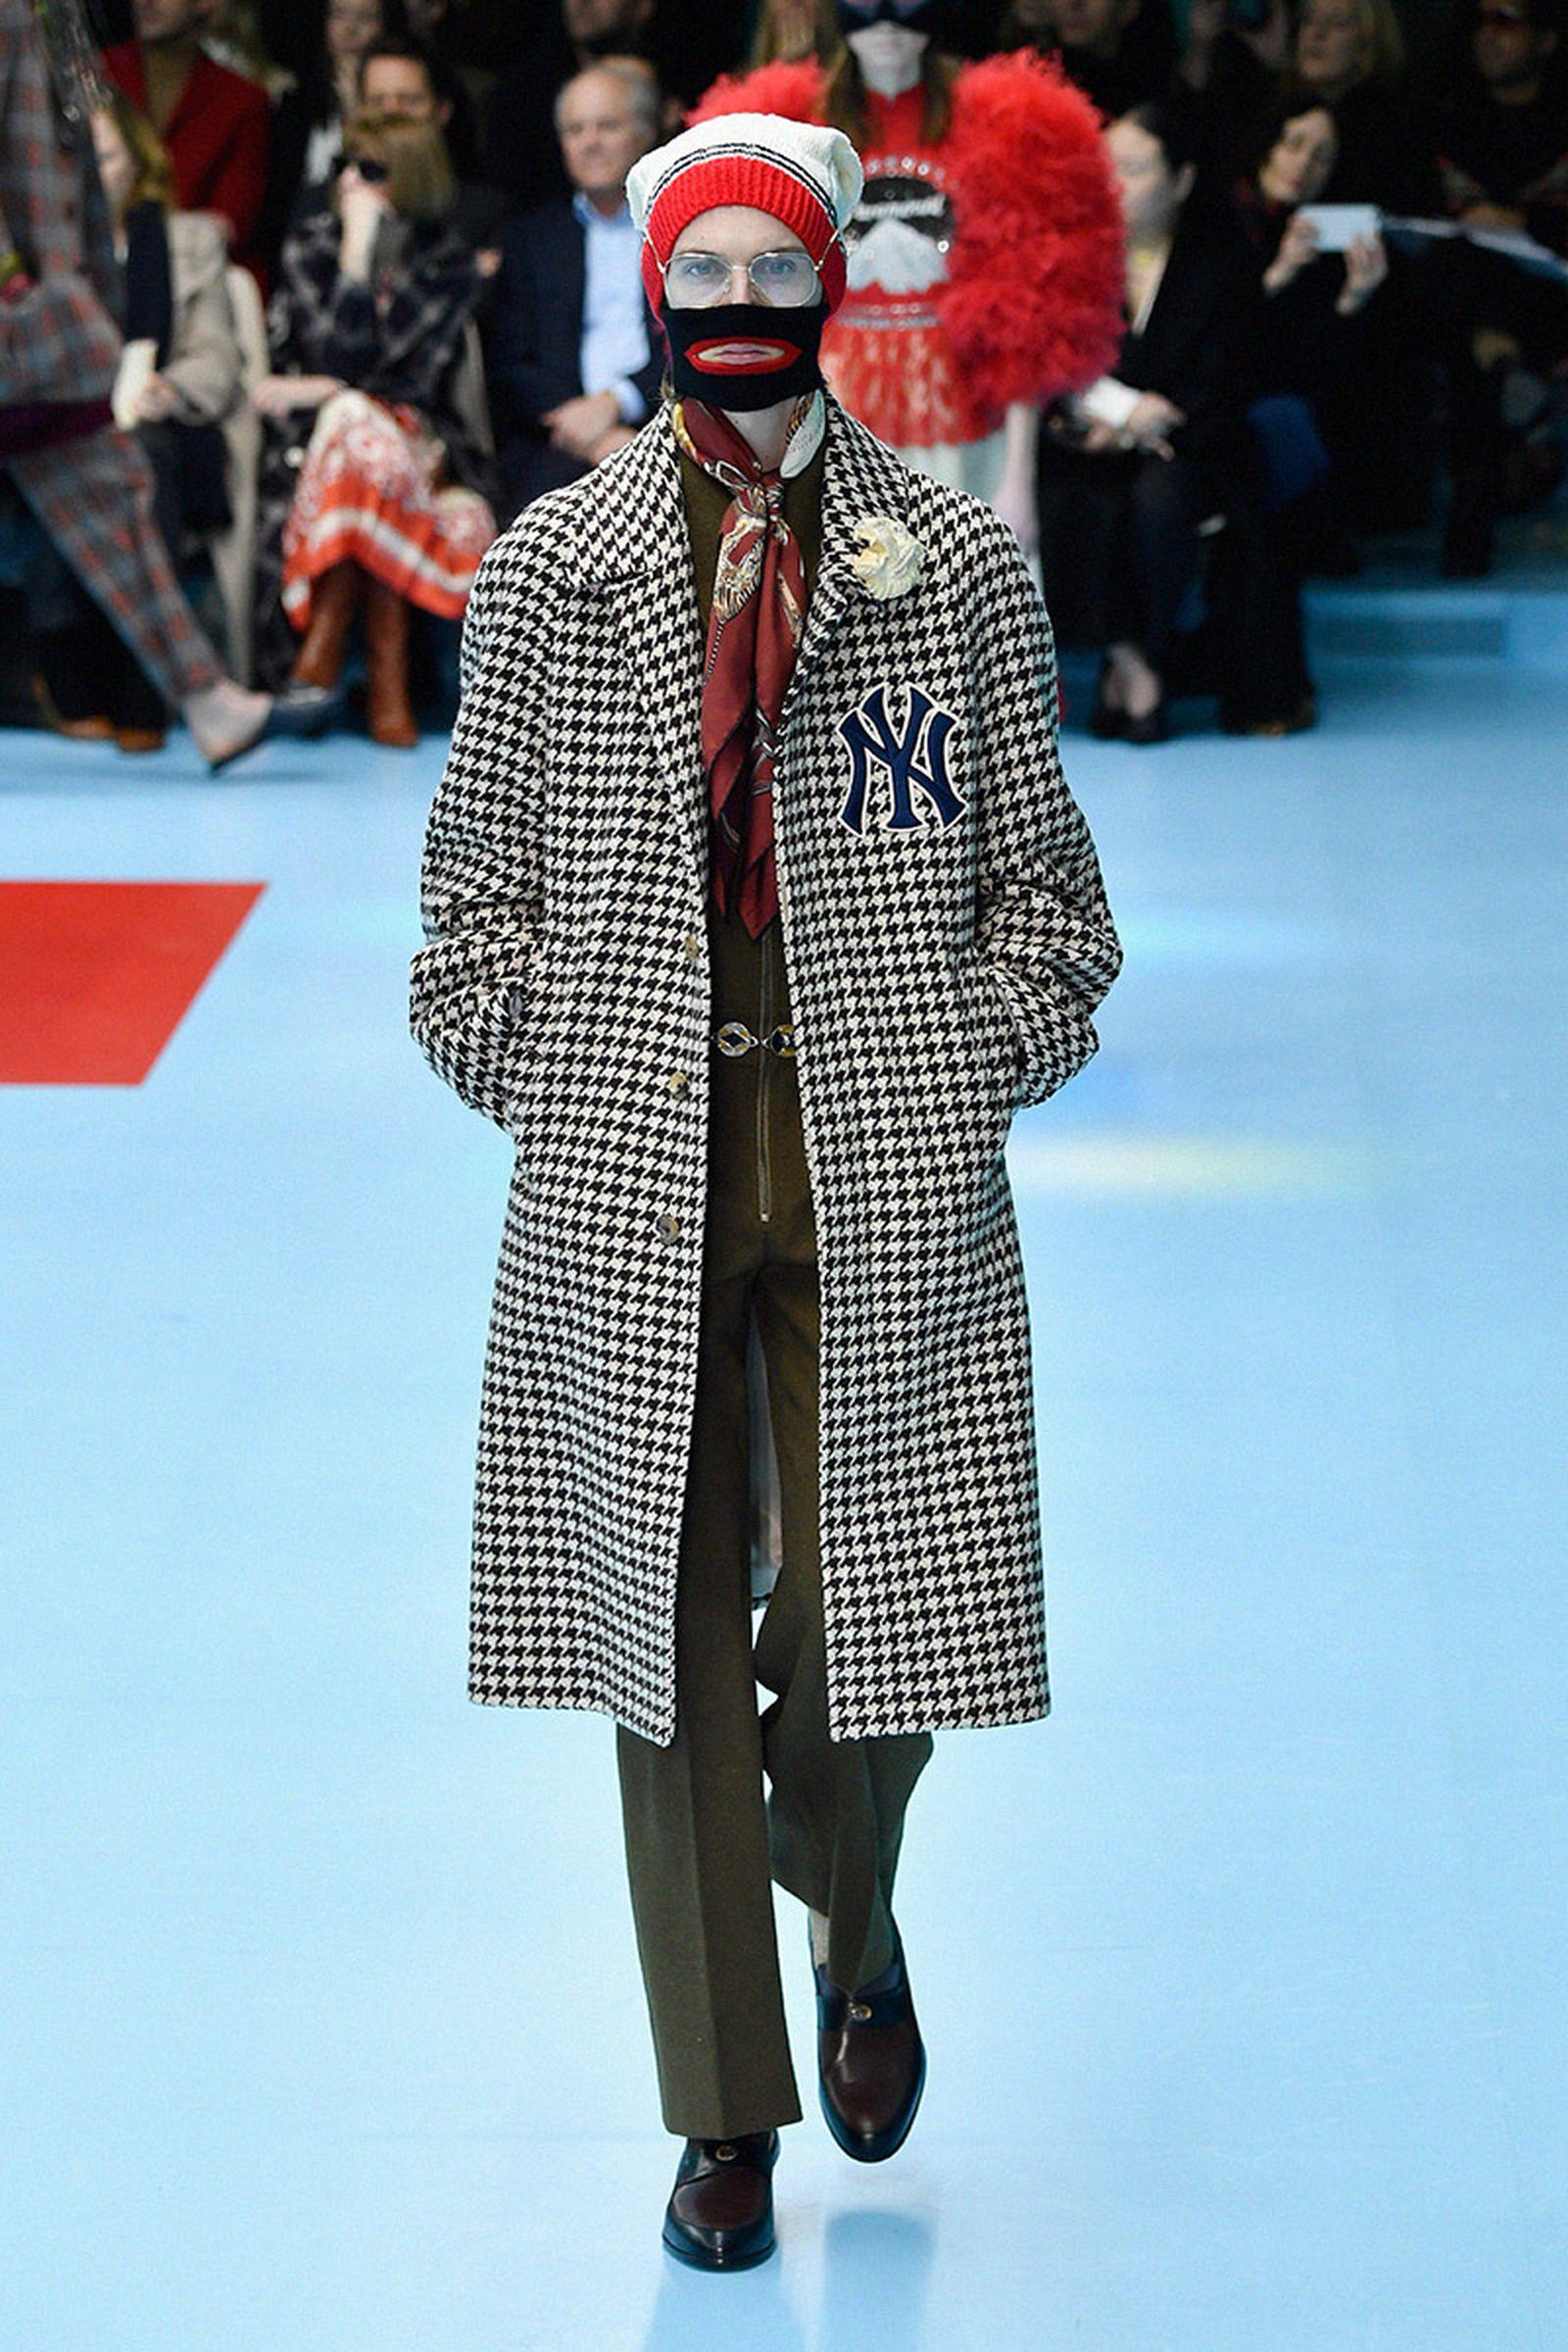 fashion age political correctness Gucci alexander mcqueen diet prada